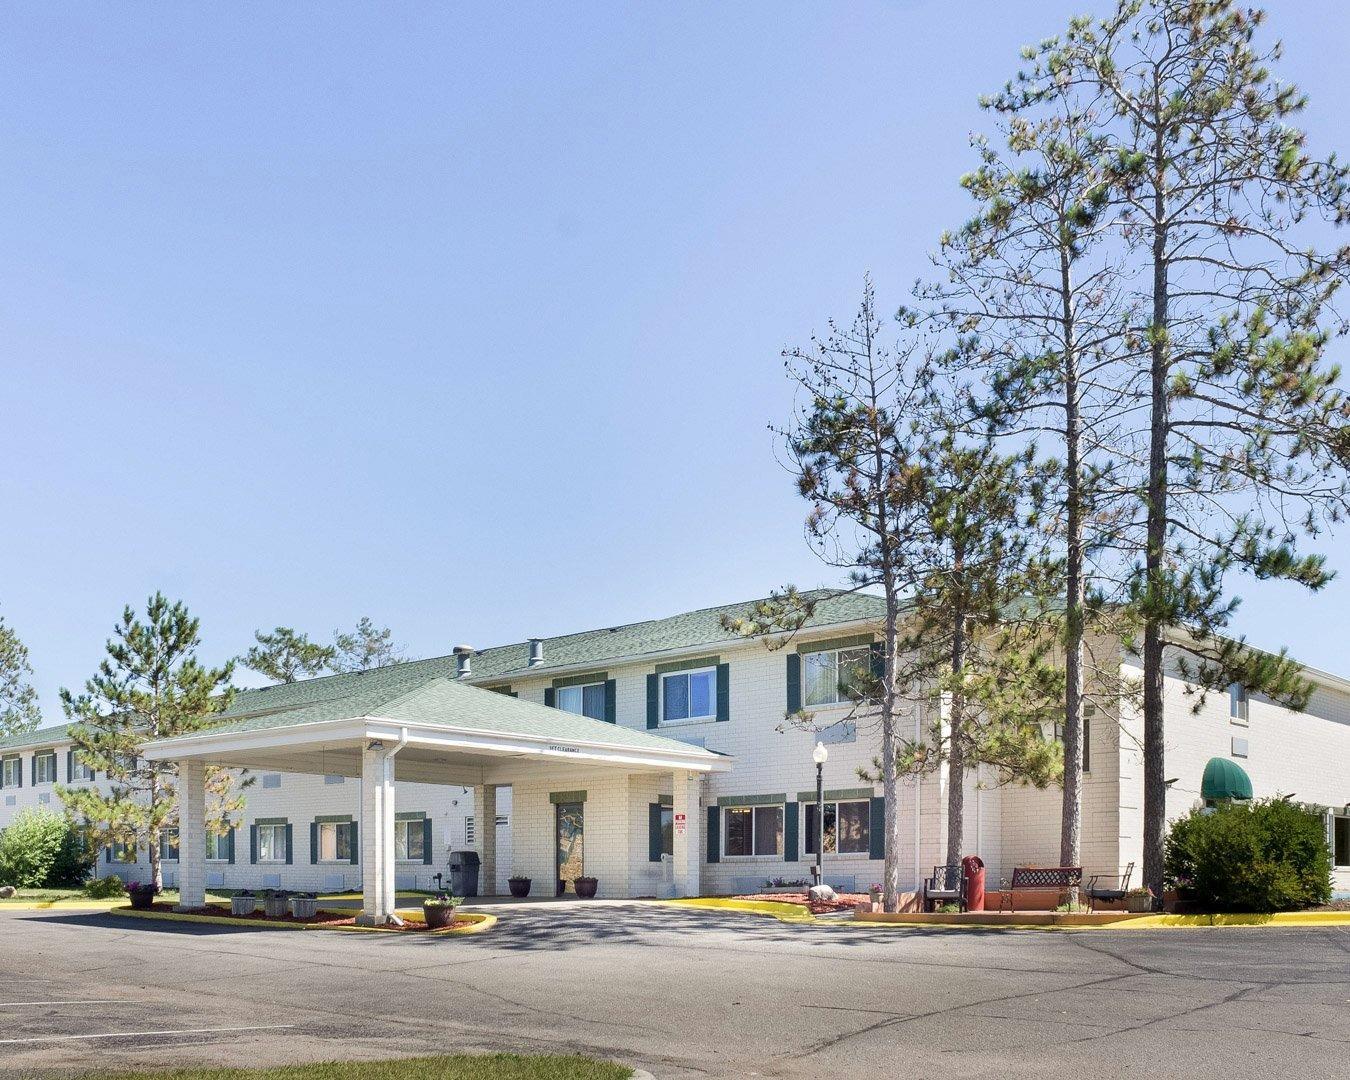 Bemidji Mn Hotels And Motels